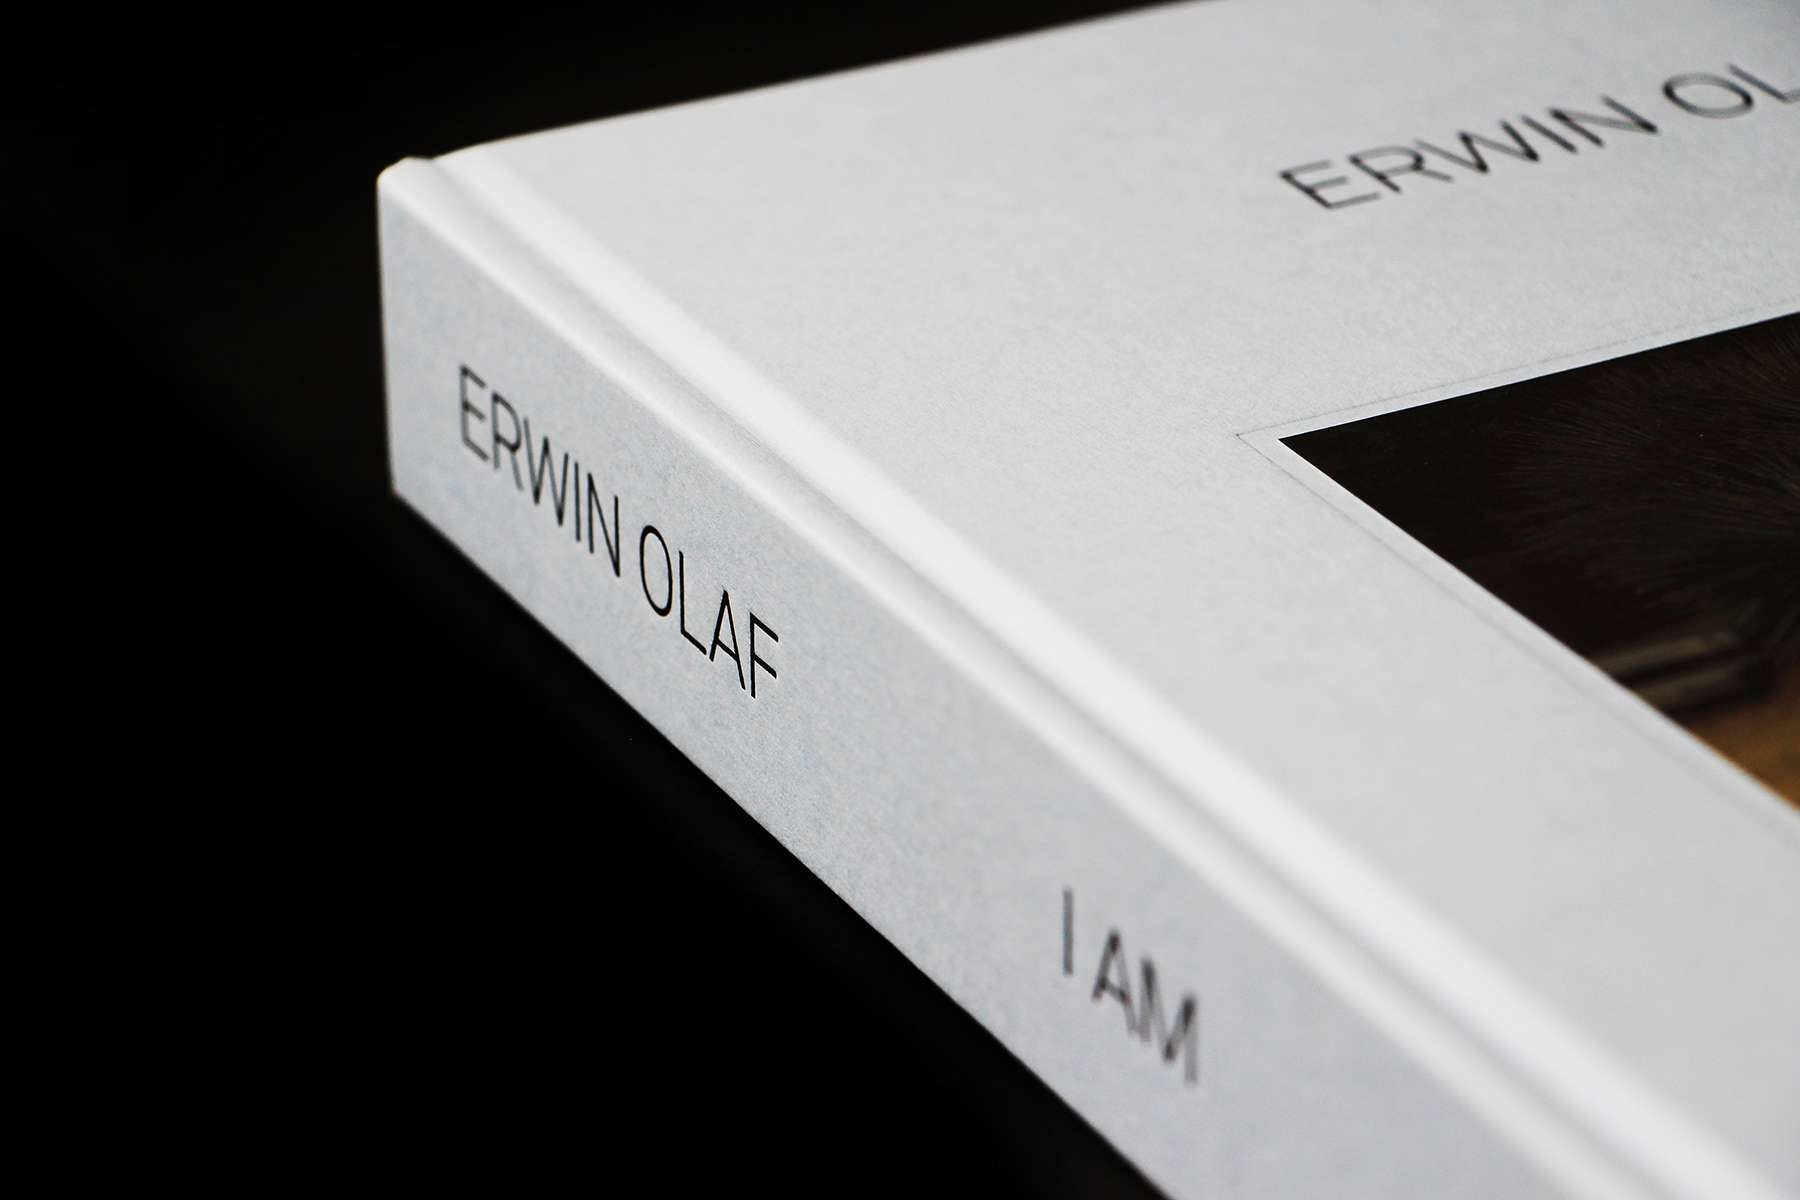 Erwin Olaf : I am 2